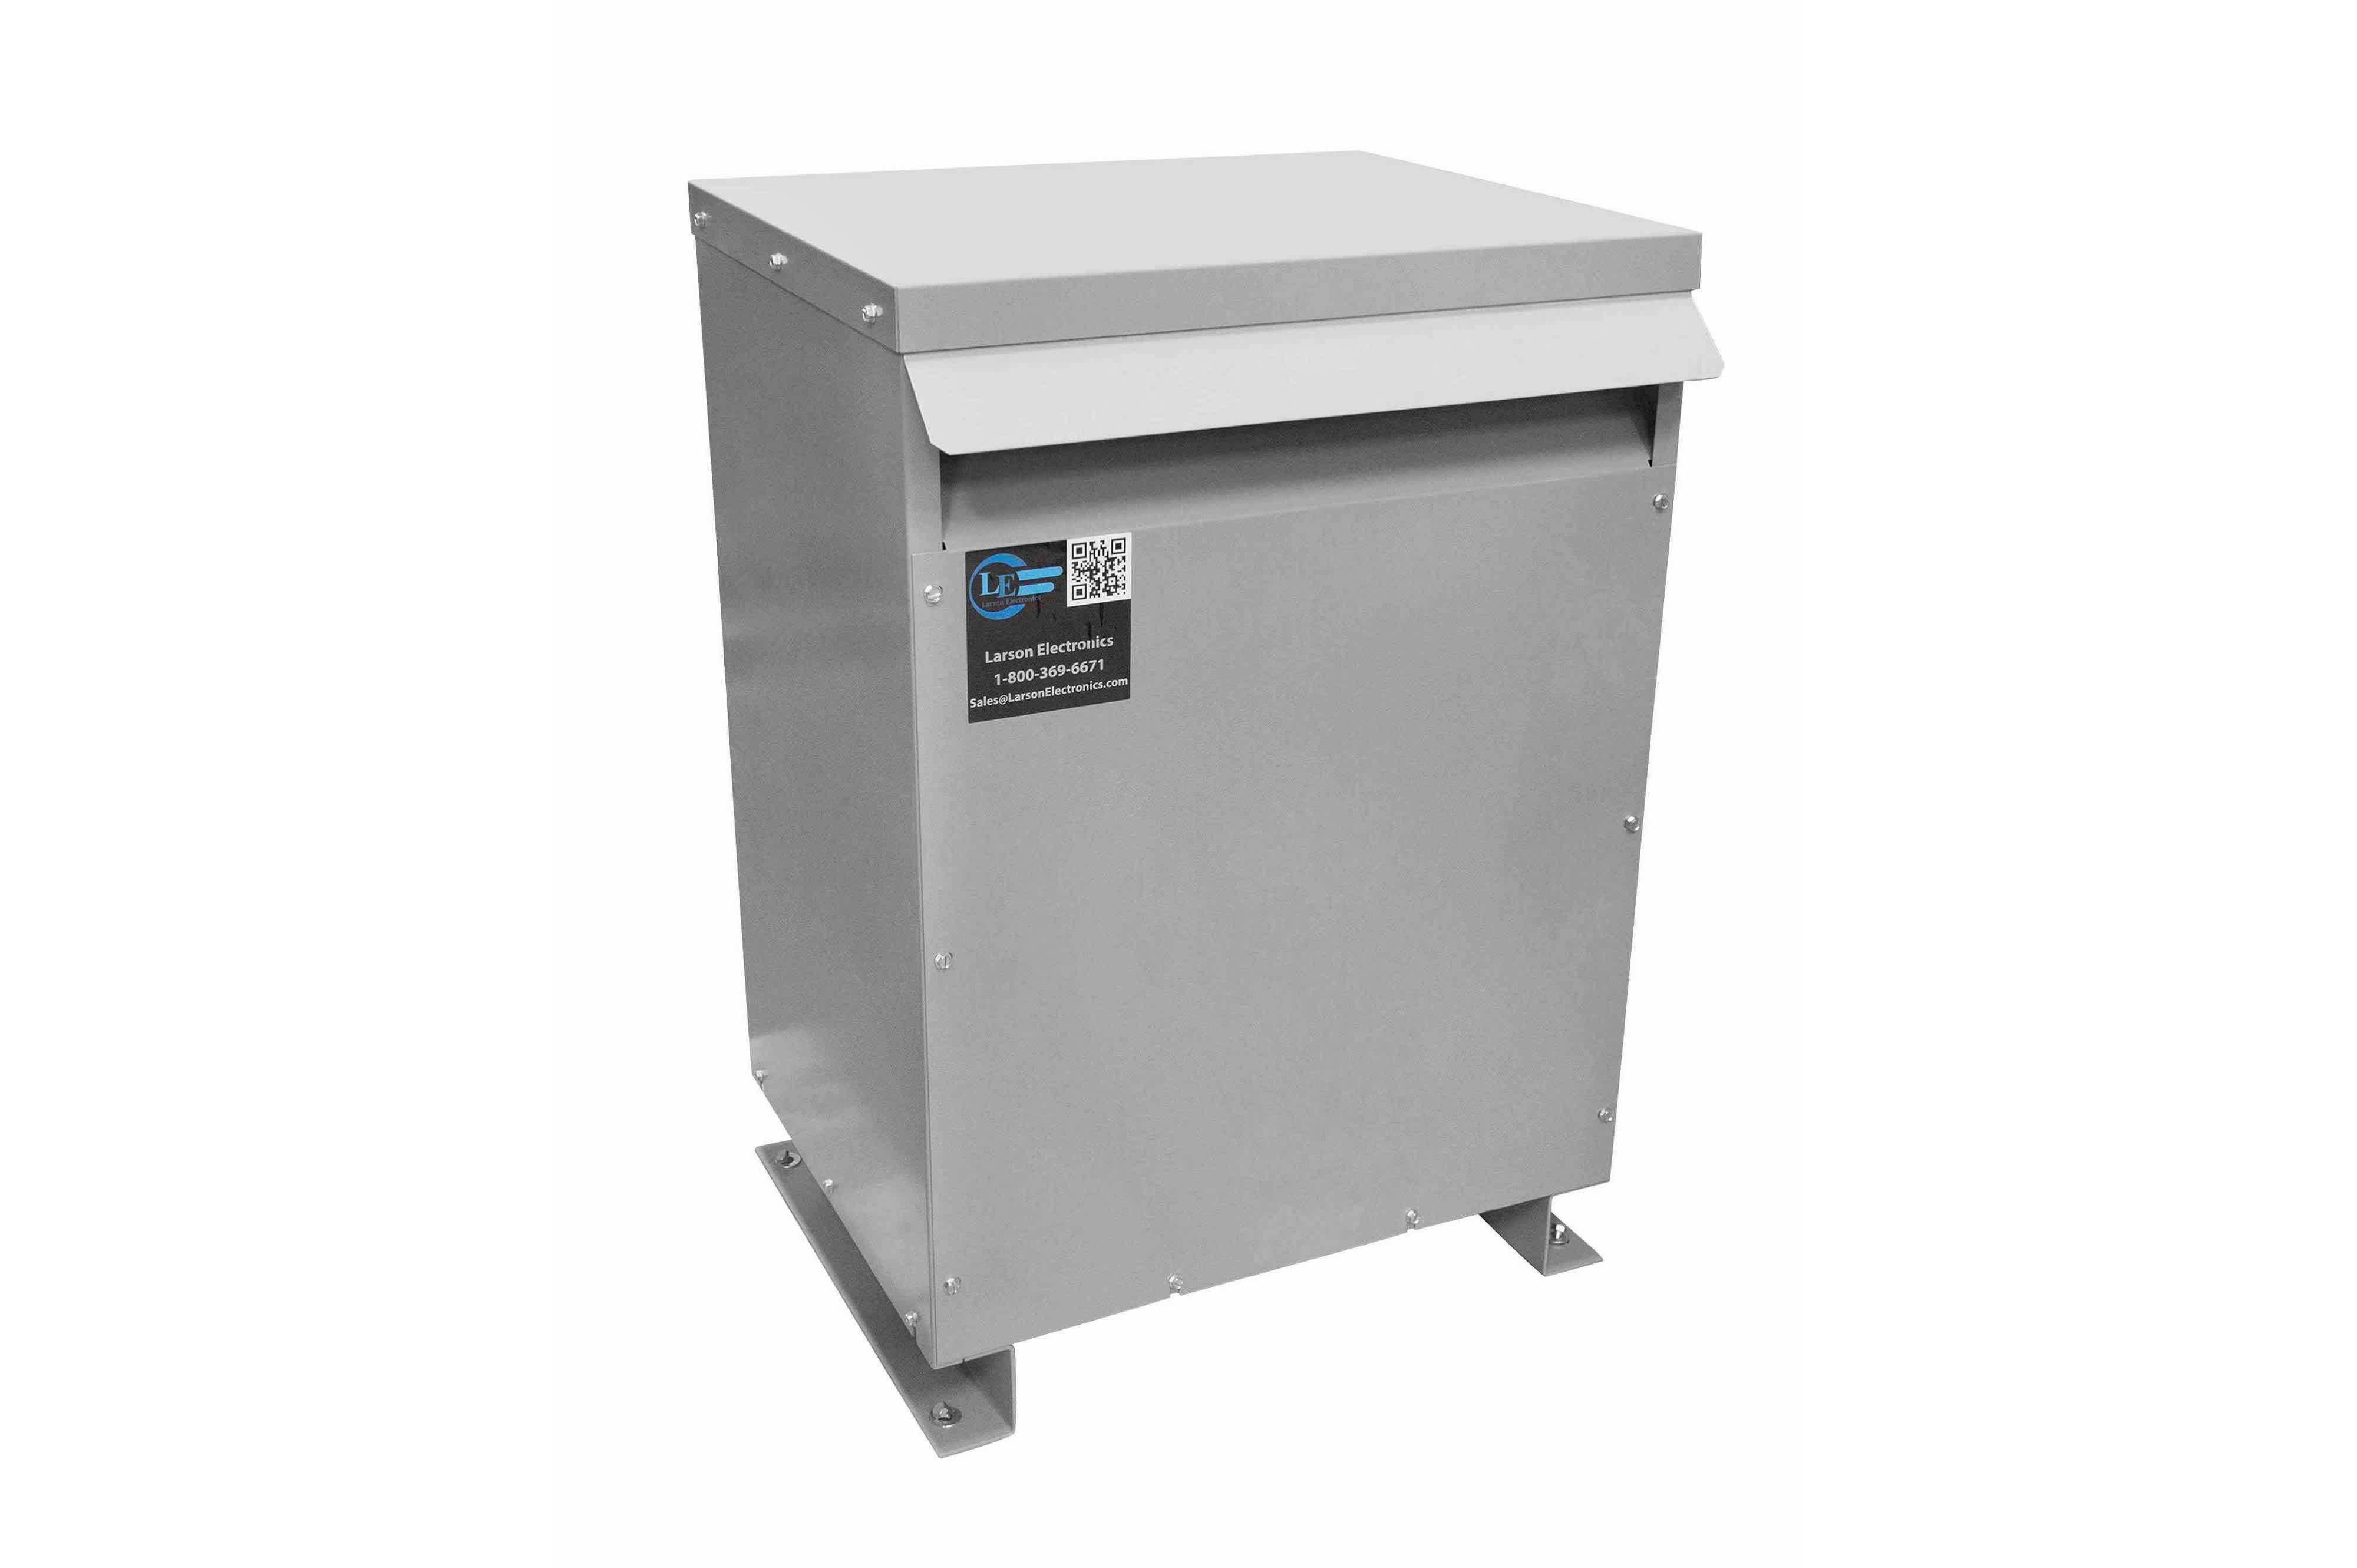 20 kVA 3PH Isolation Transformer, 600V Wye Primary, 240V/120 Delta Secondary, N3R, Ventilated, 60 Hz